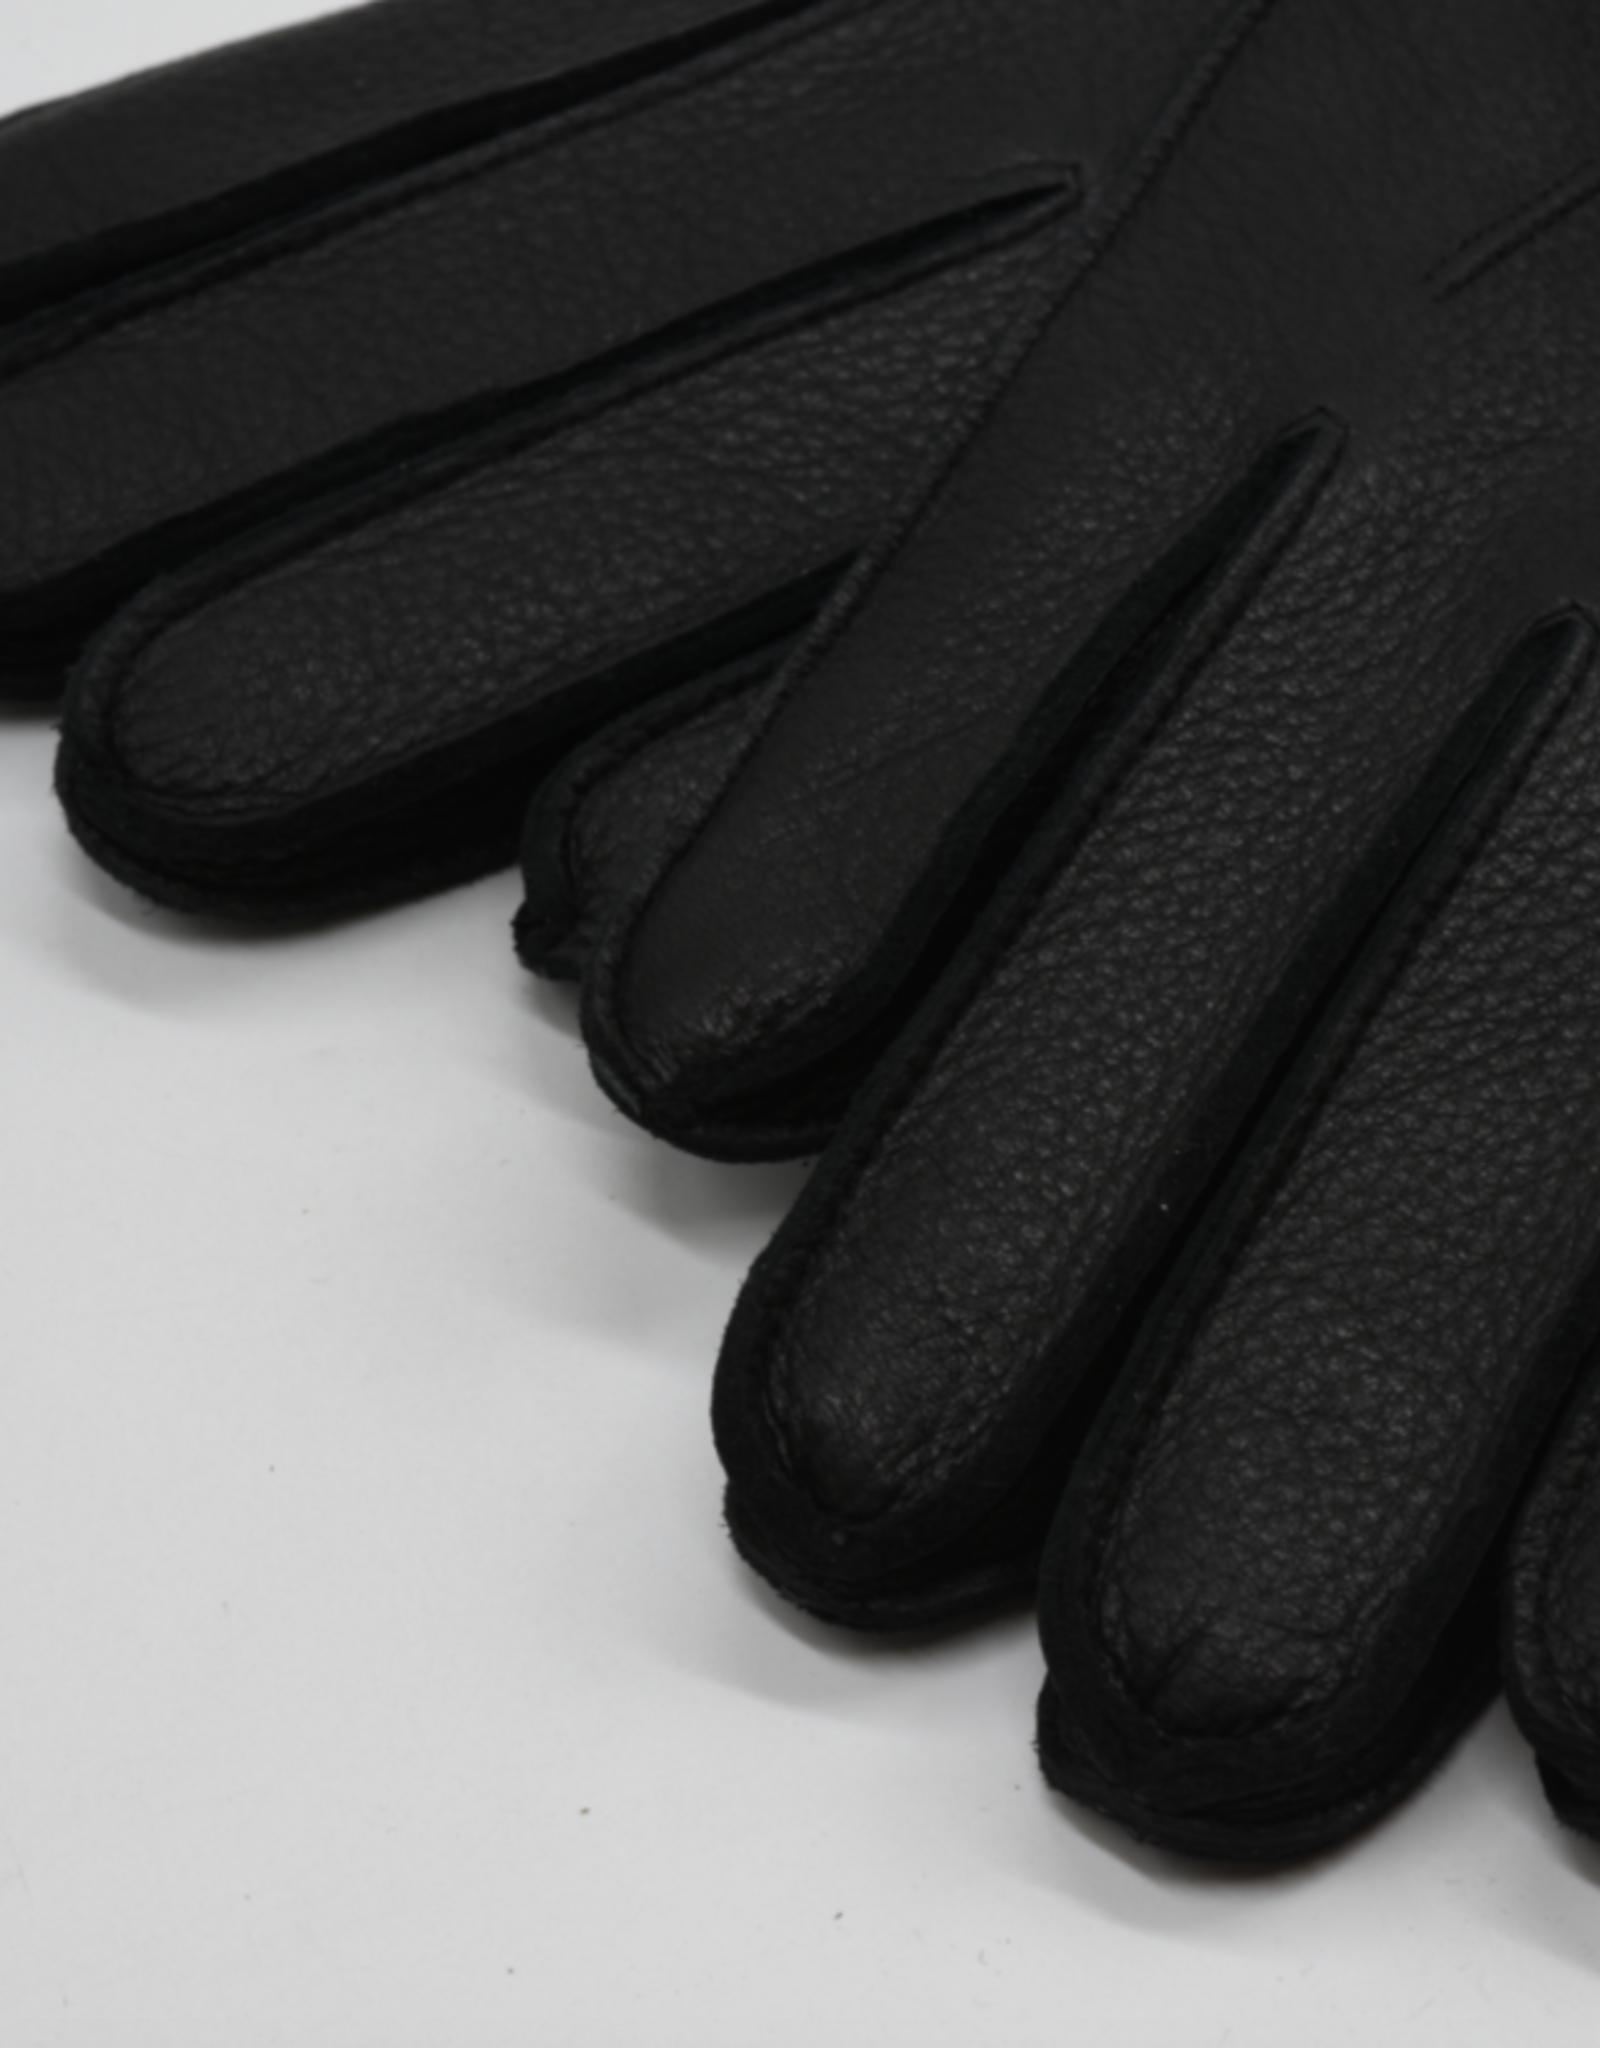 Deerskin Leather Glove